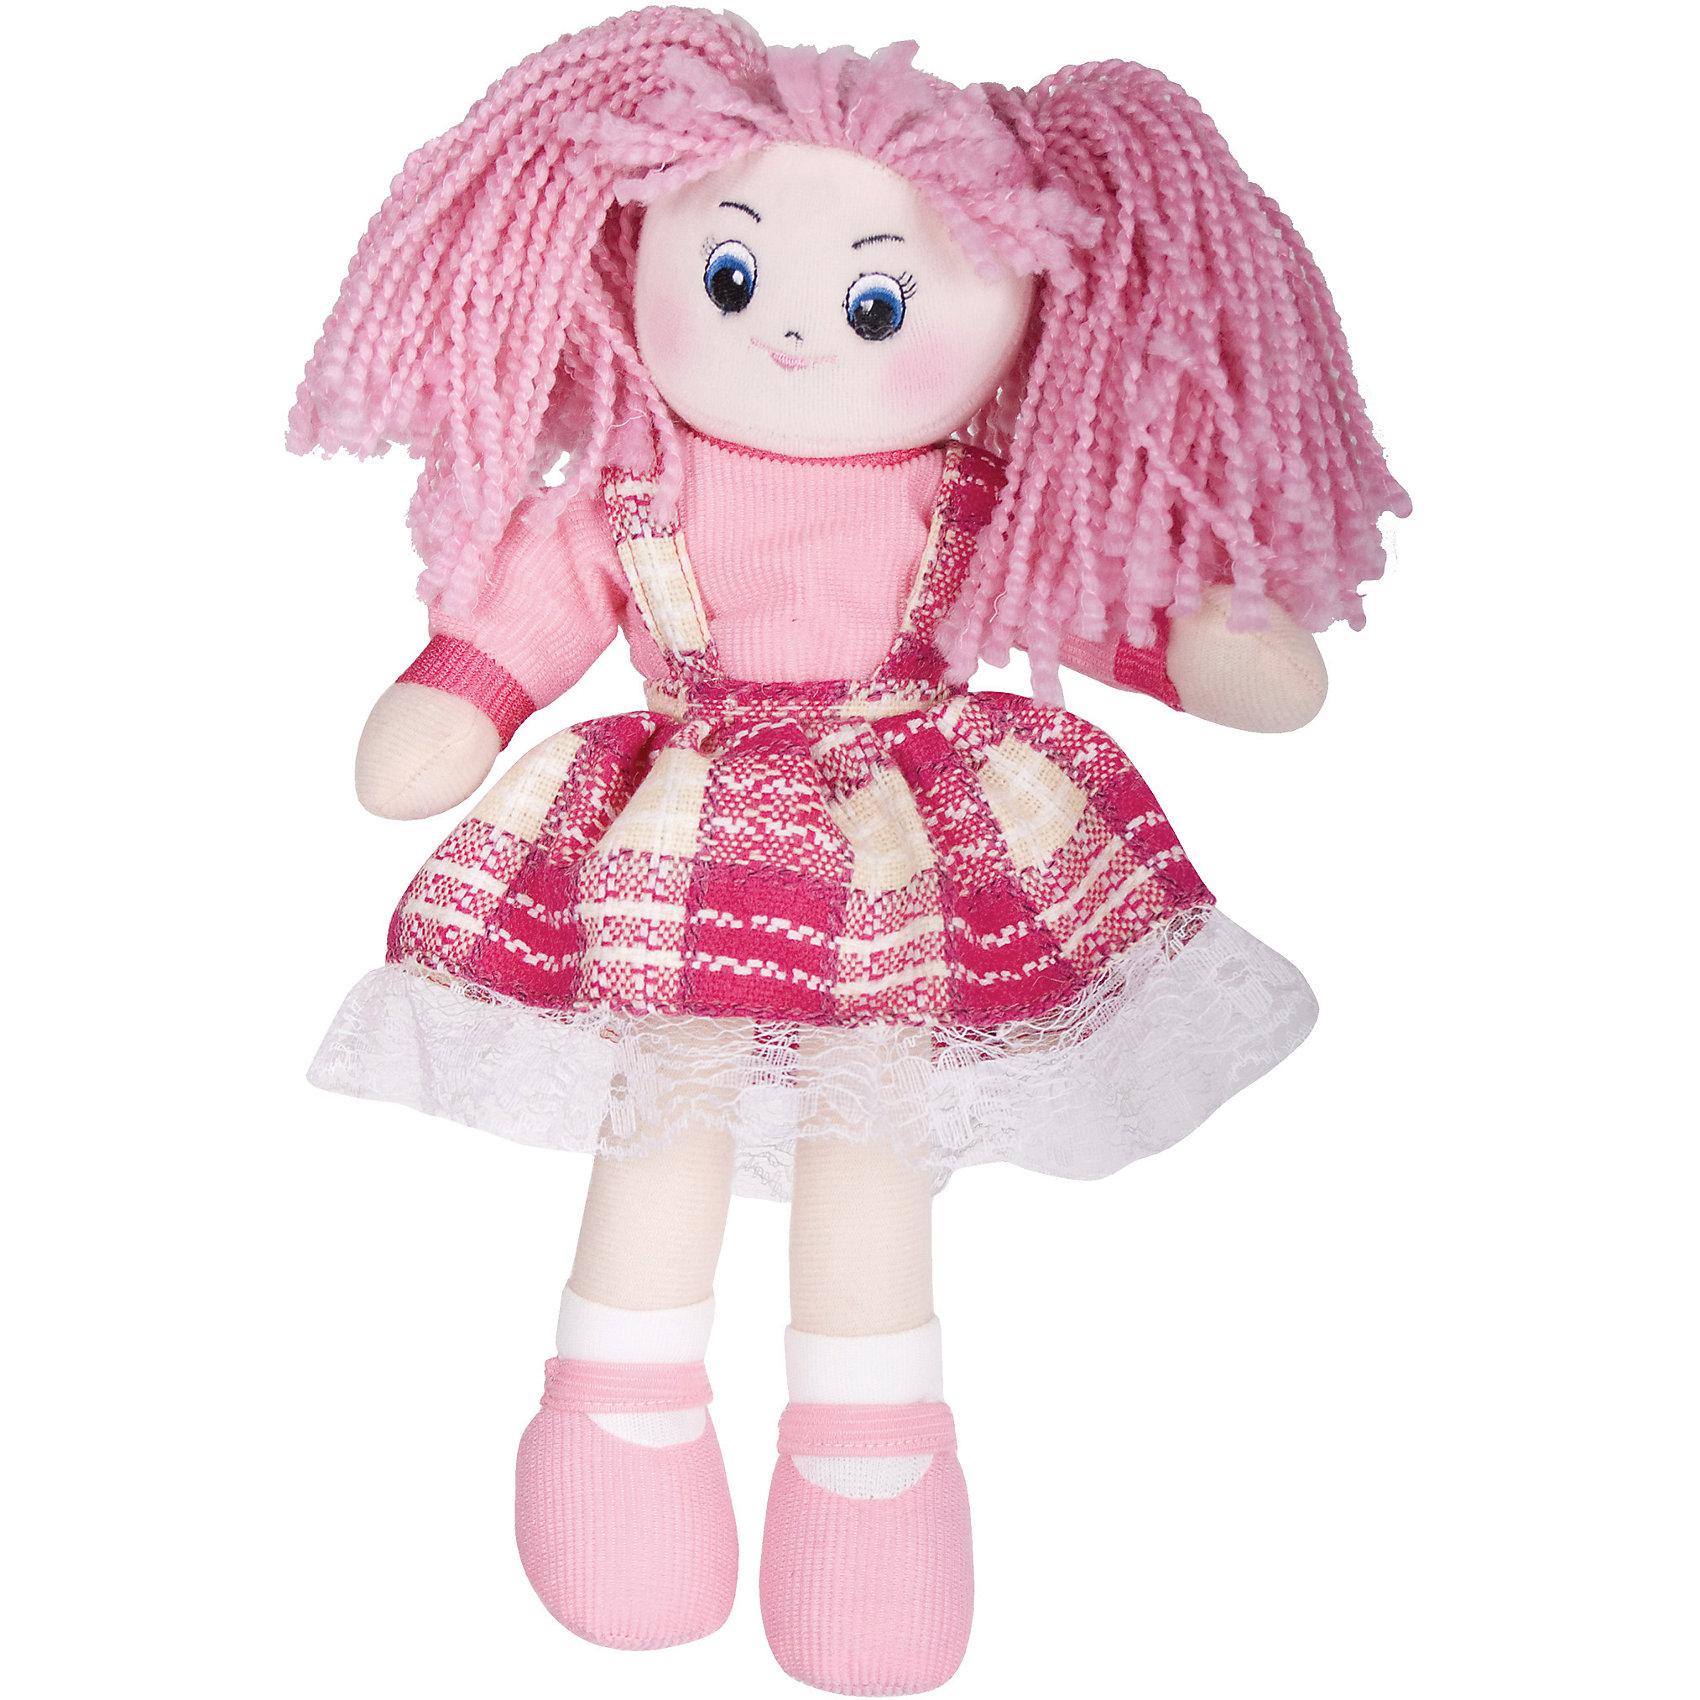 Gulliver Кукла Клубничка, 30см, Gulliver игрушка мягкая gulliver кукла хозяюшка 30см